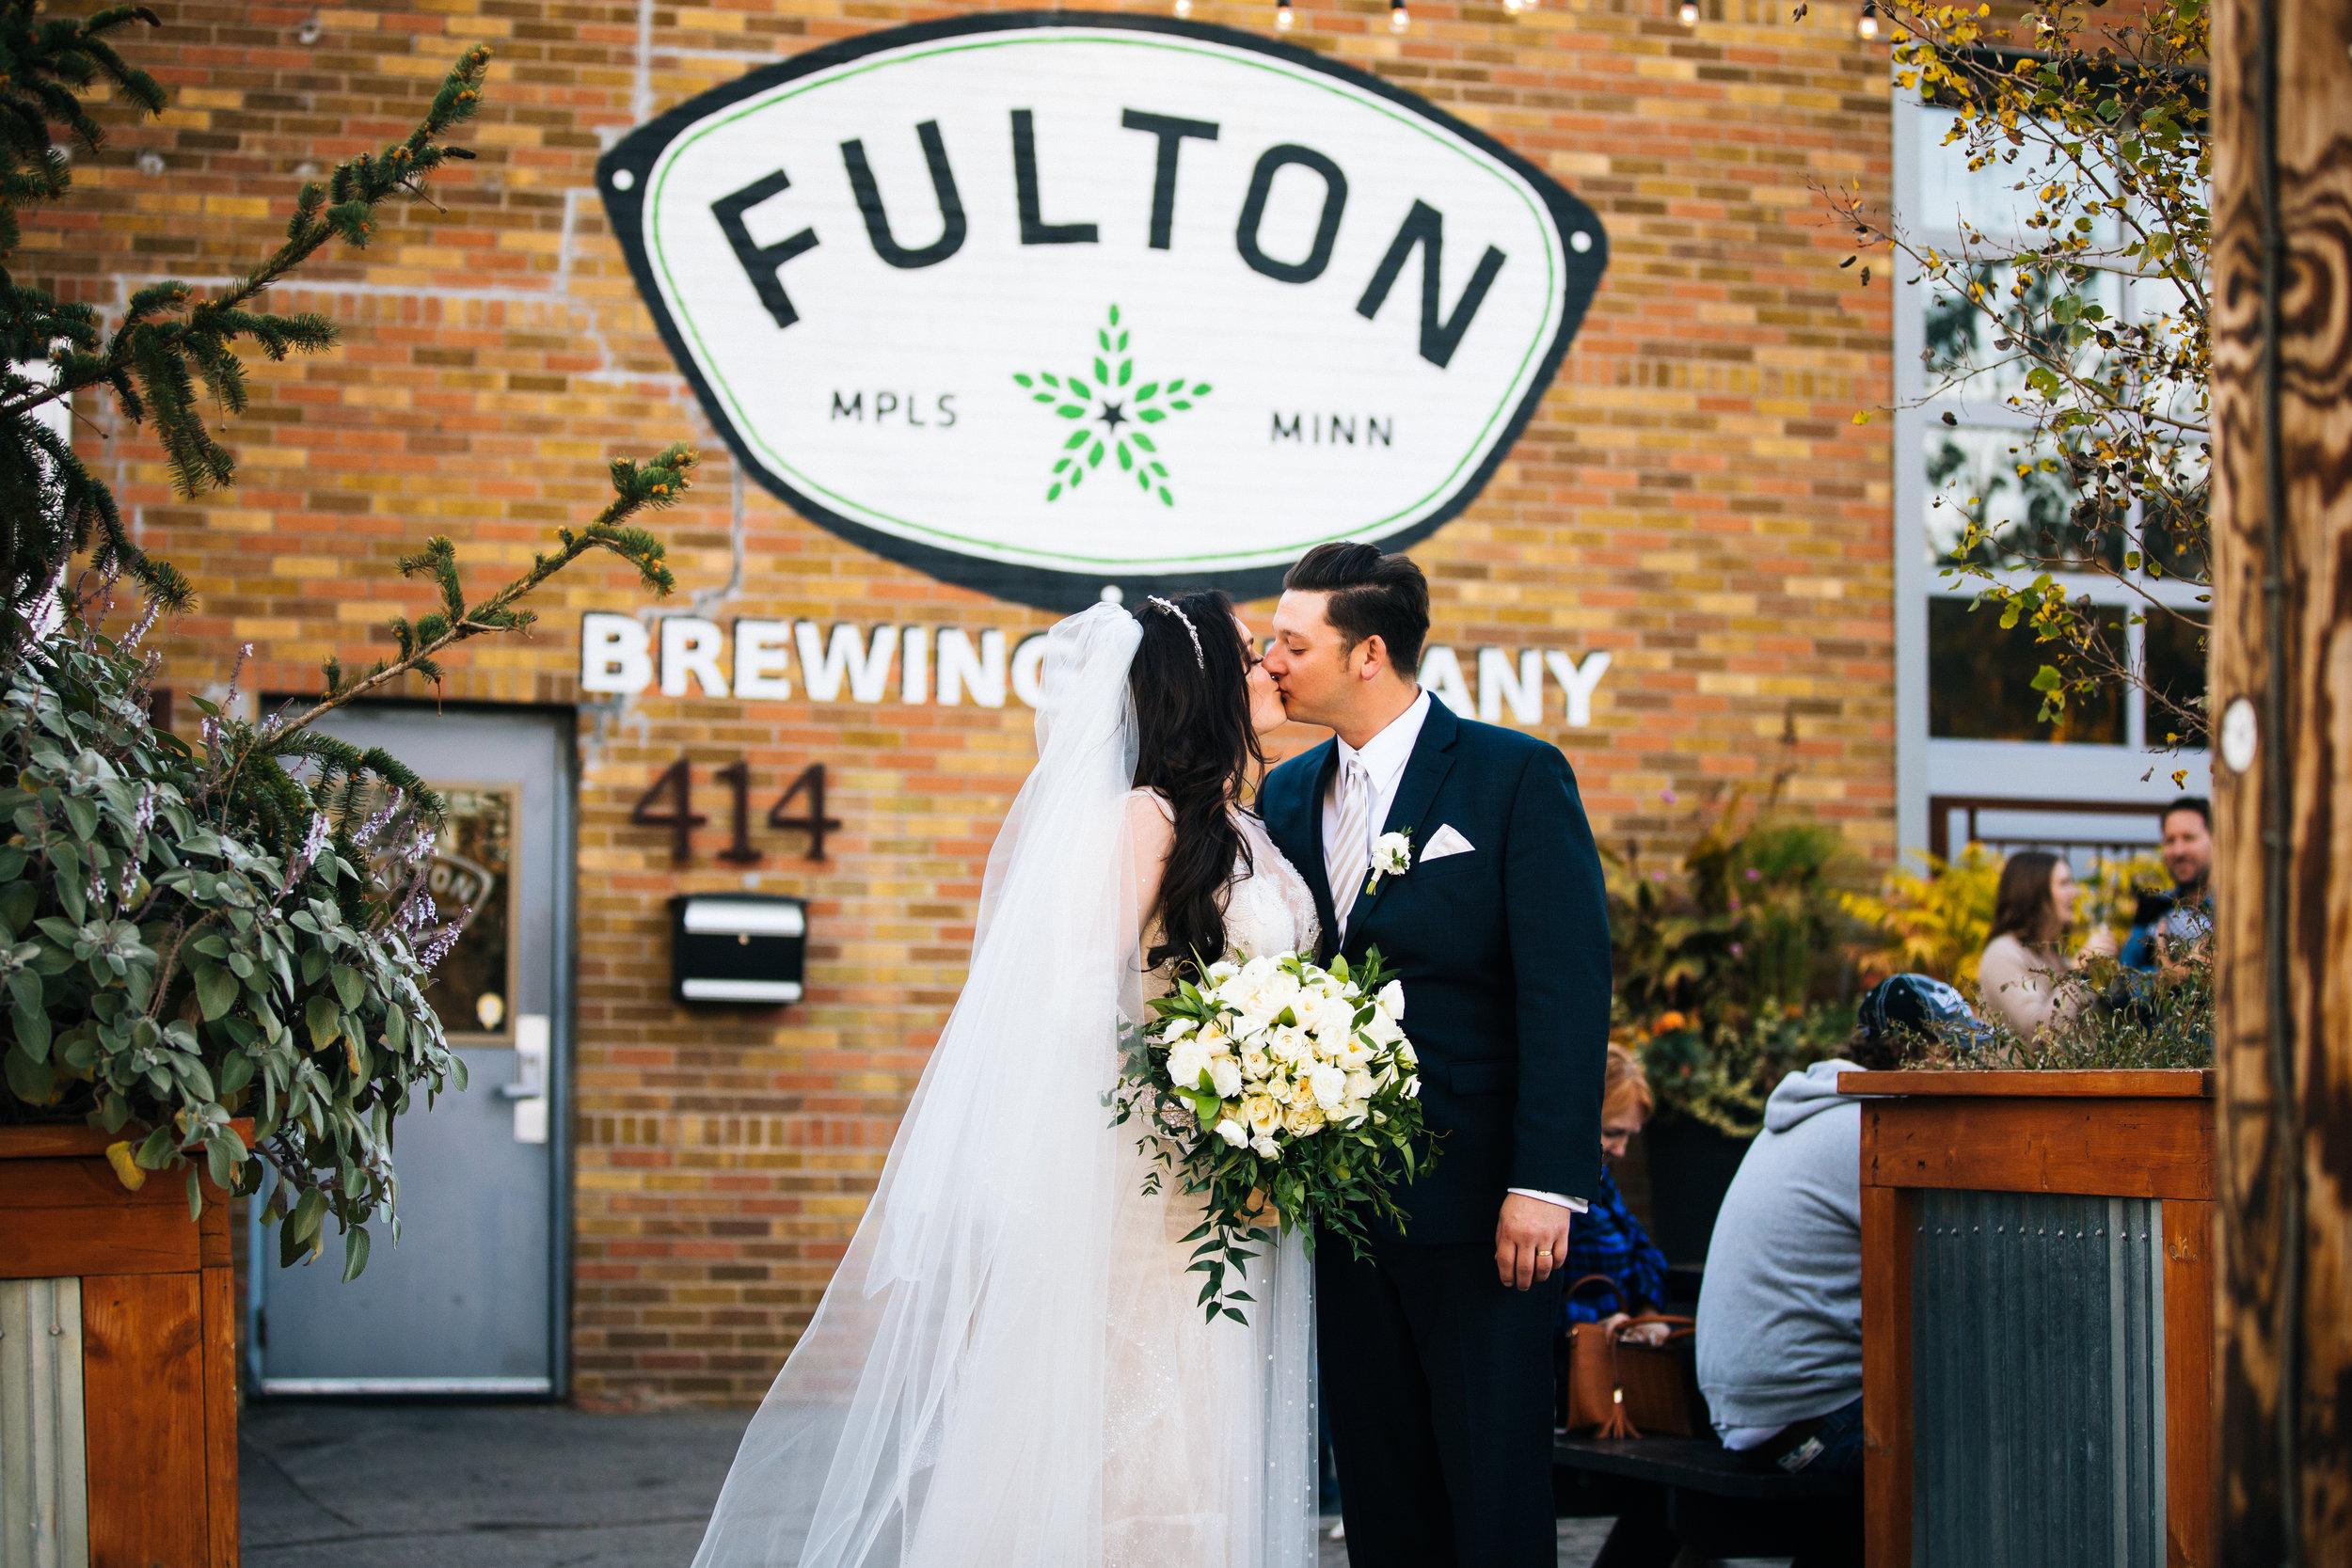 Fulton Wedding Photo